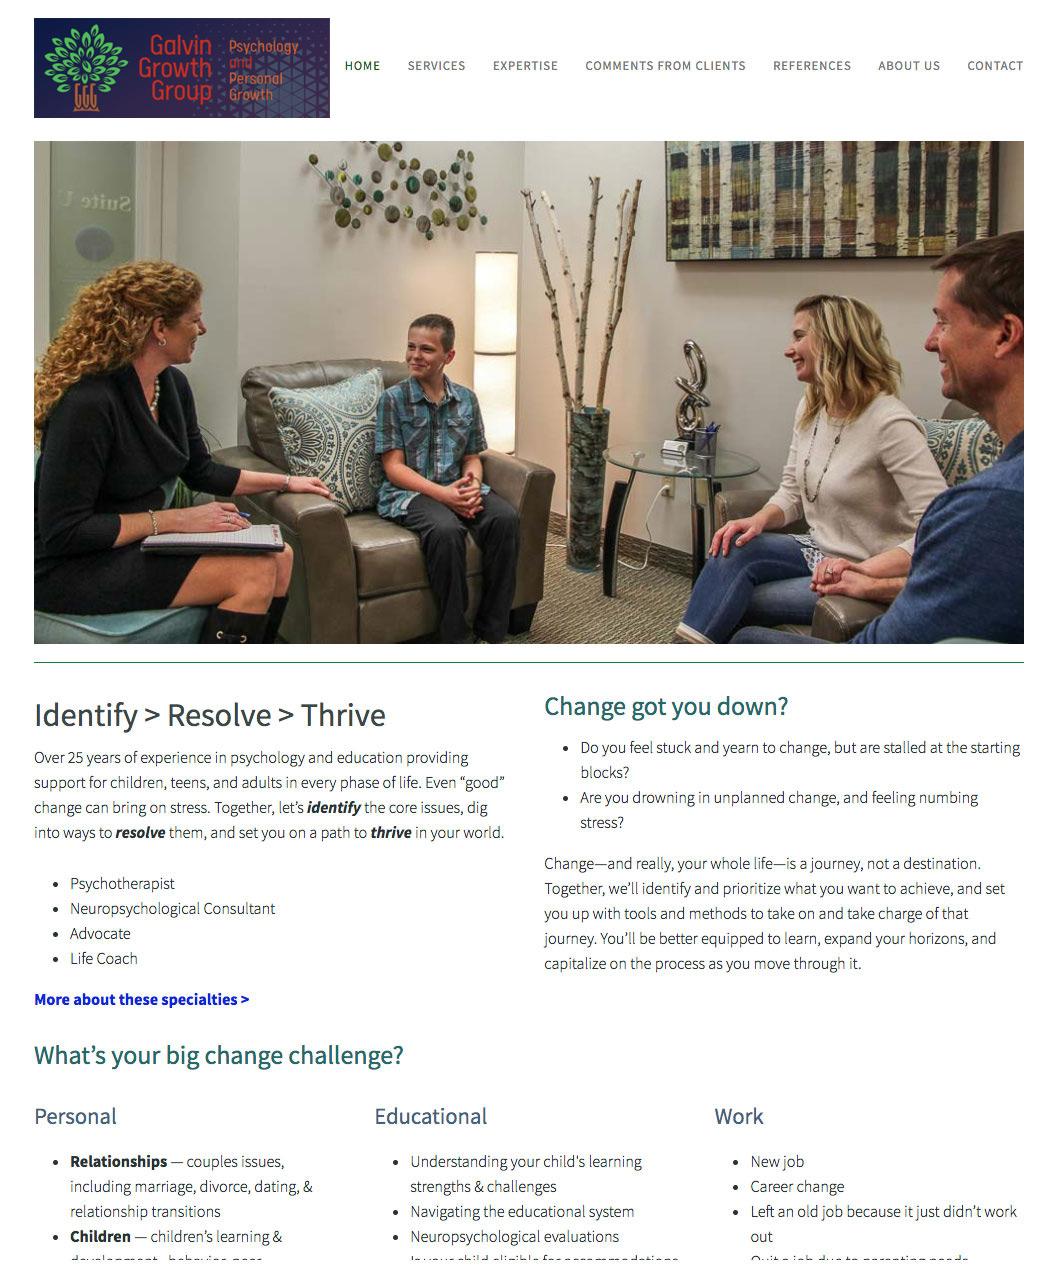 Julie-Galvin-Website-Home-Page.jpg